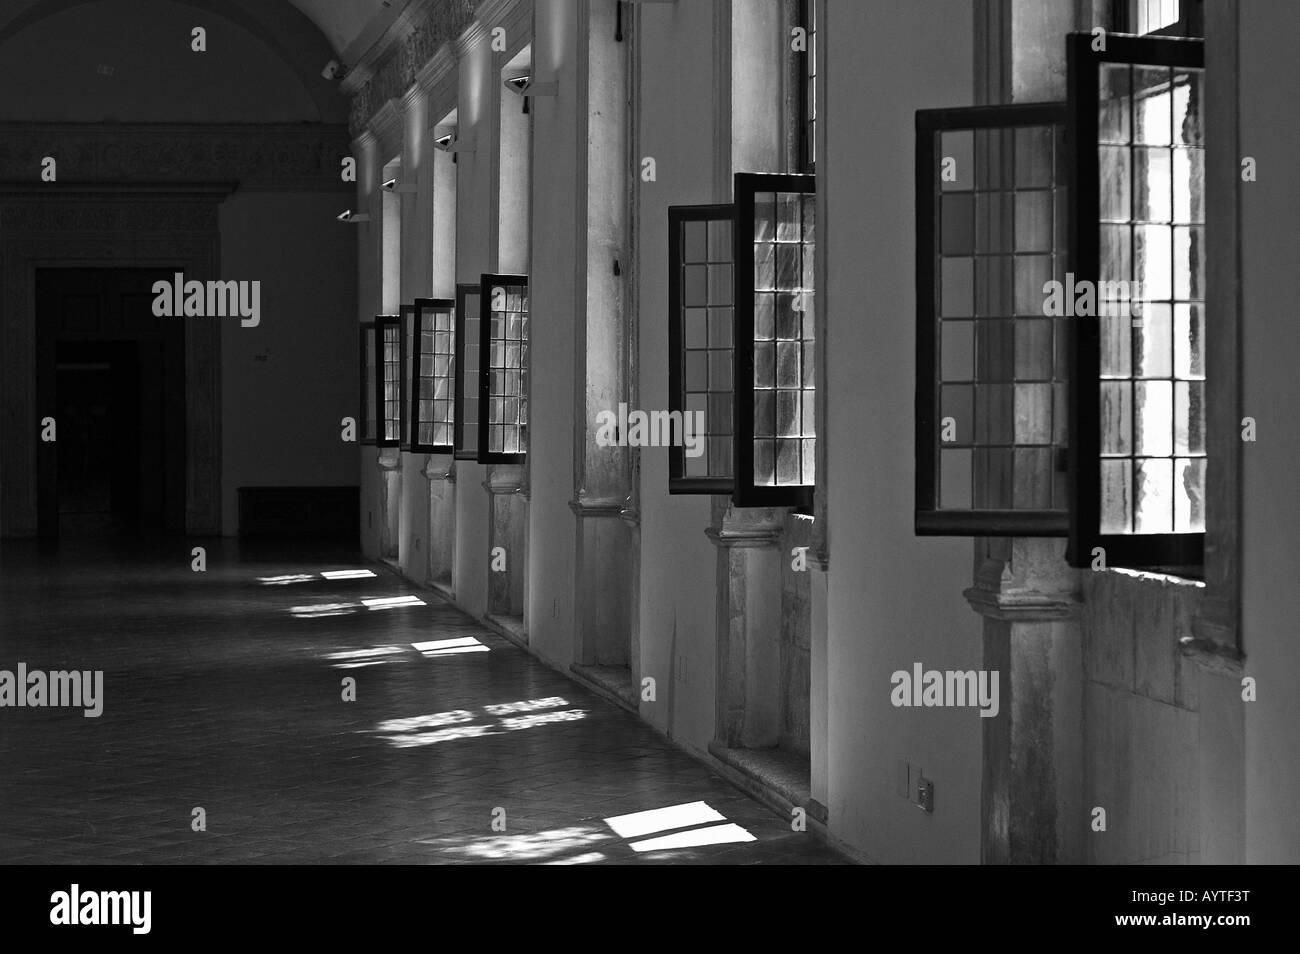 hallway with open windows - Stock Image